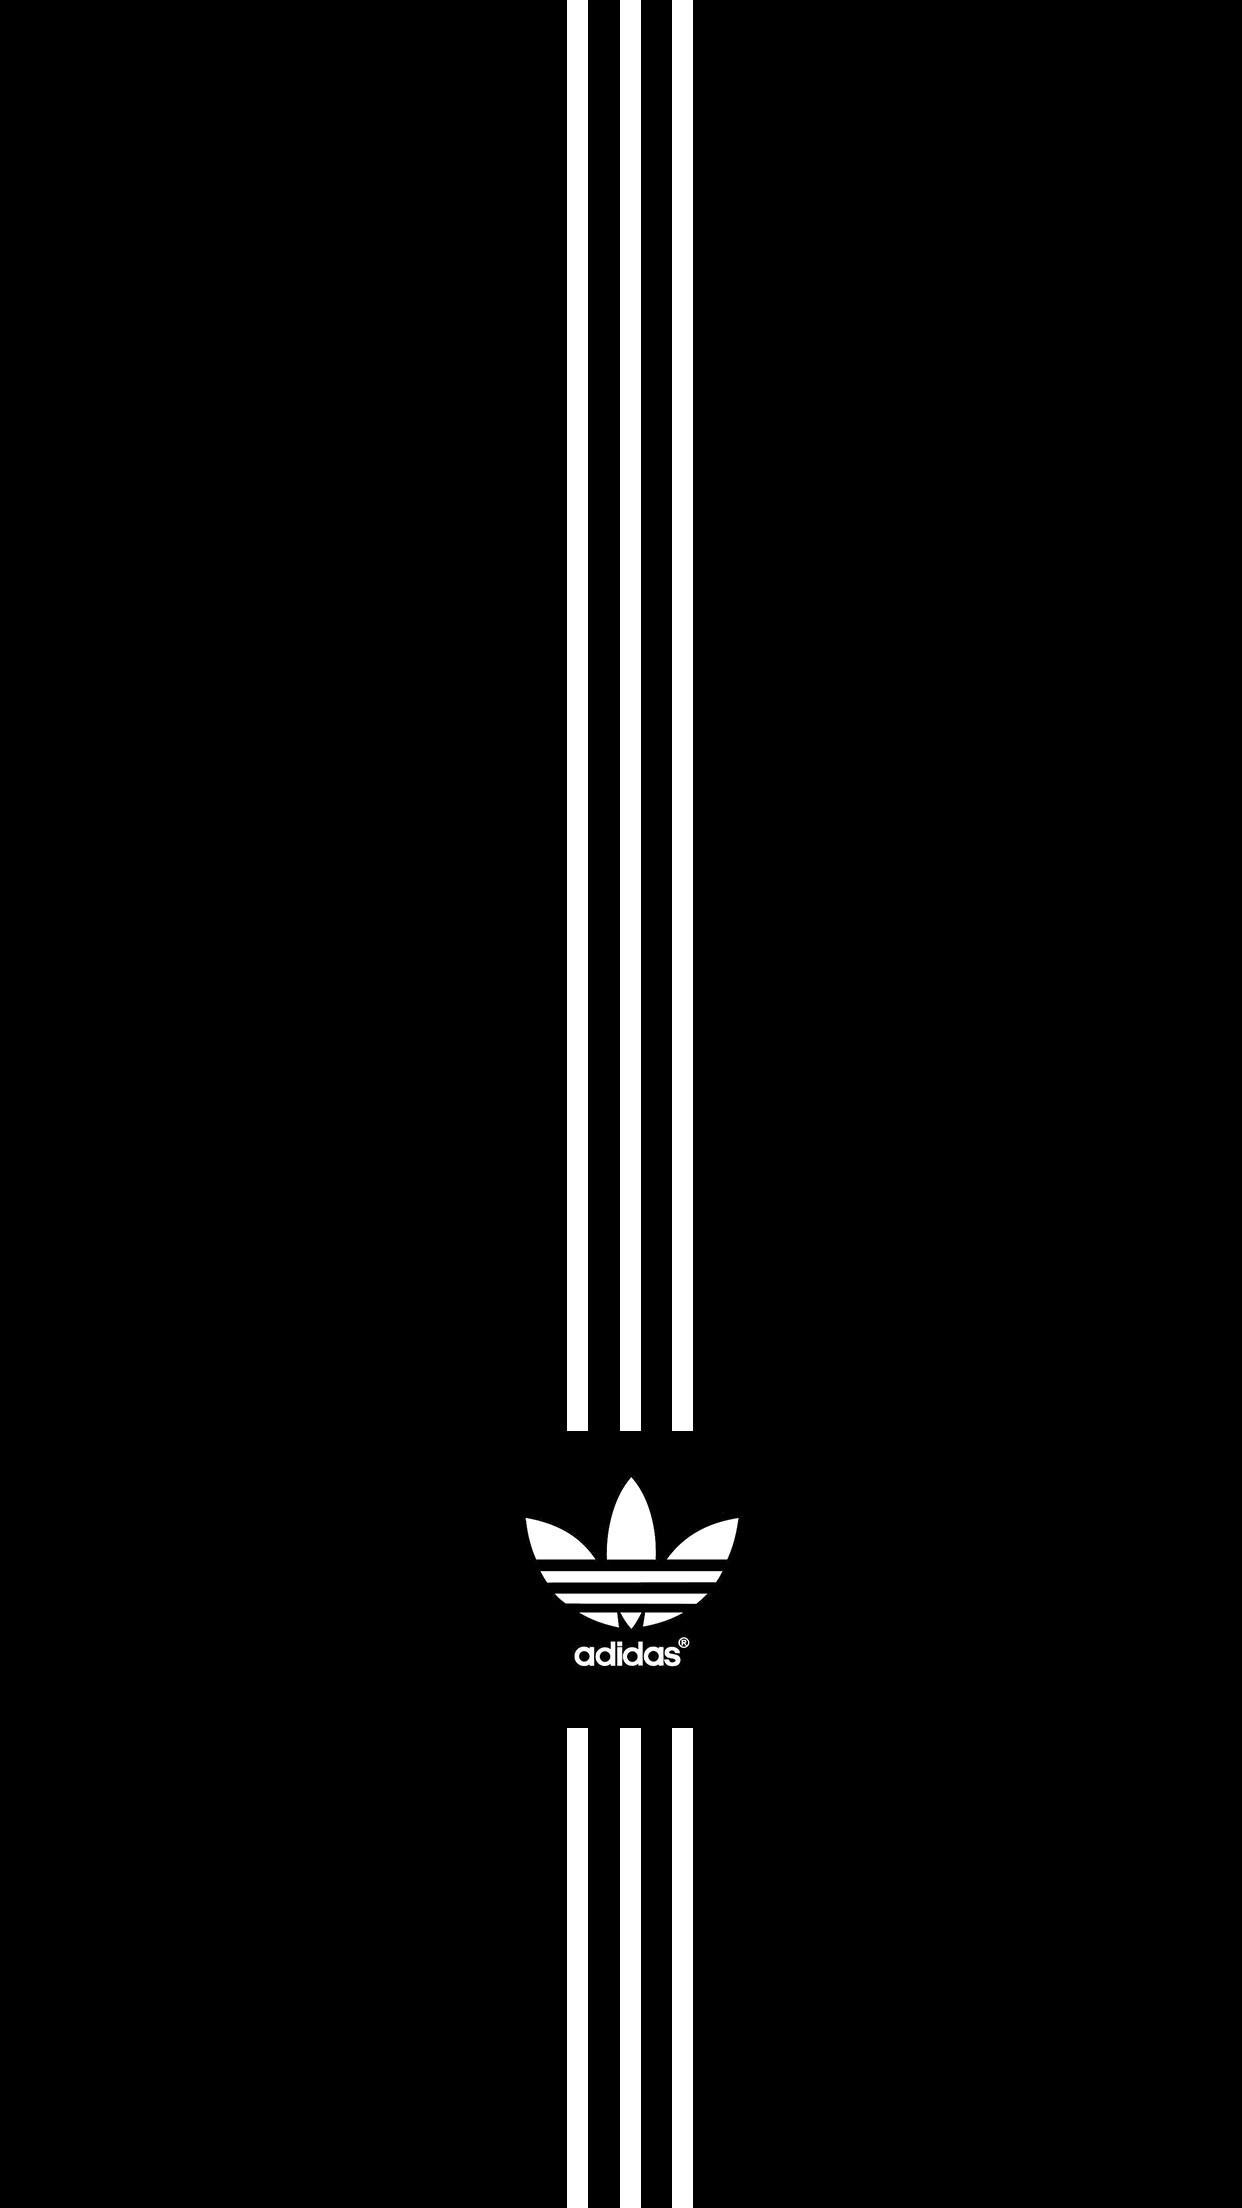 Adidas Wallpaper (76+ images)